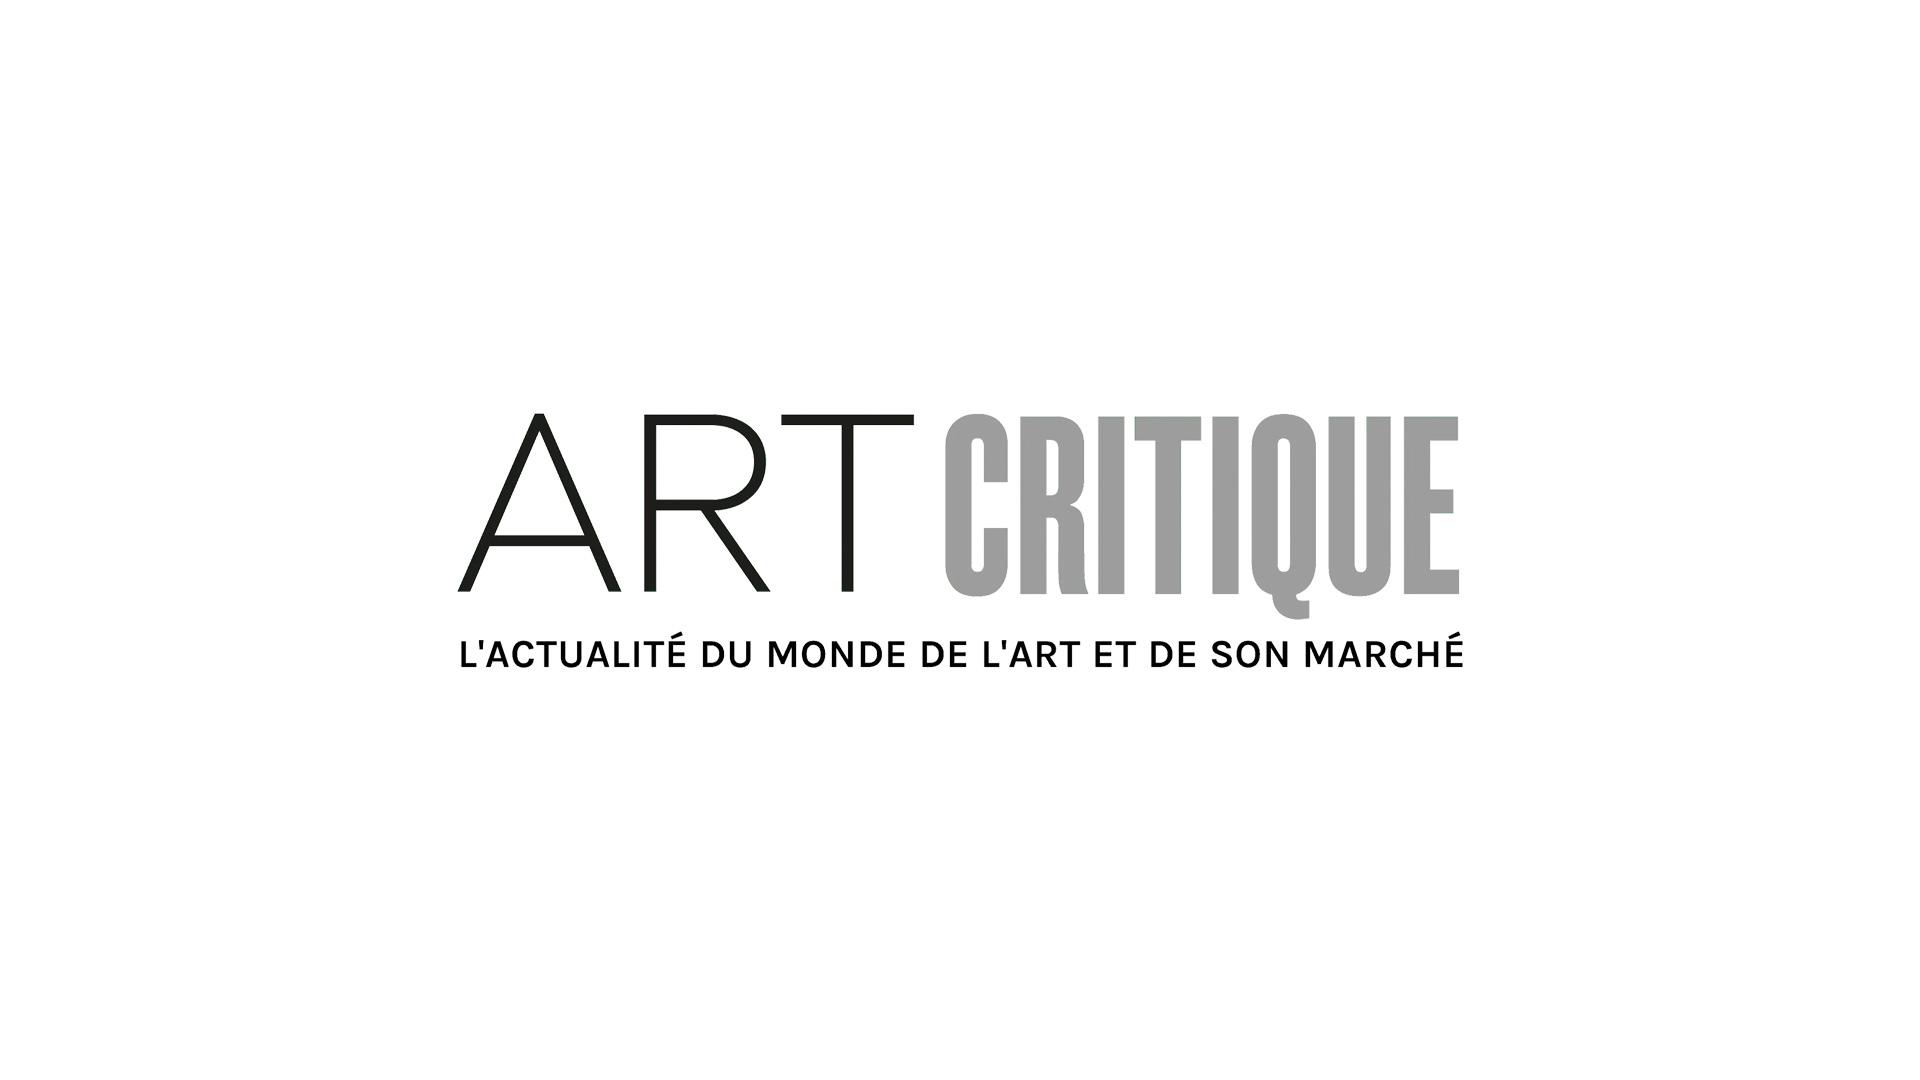 Deaccessioning artwork: the complex problem facing museums